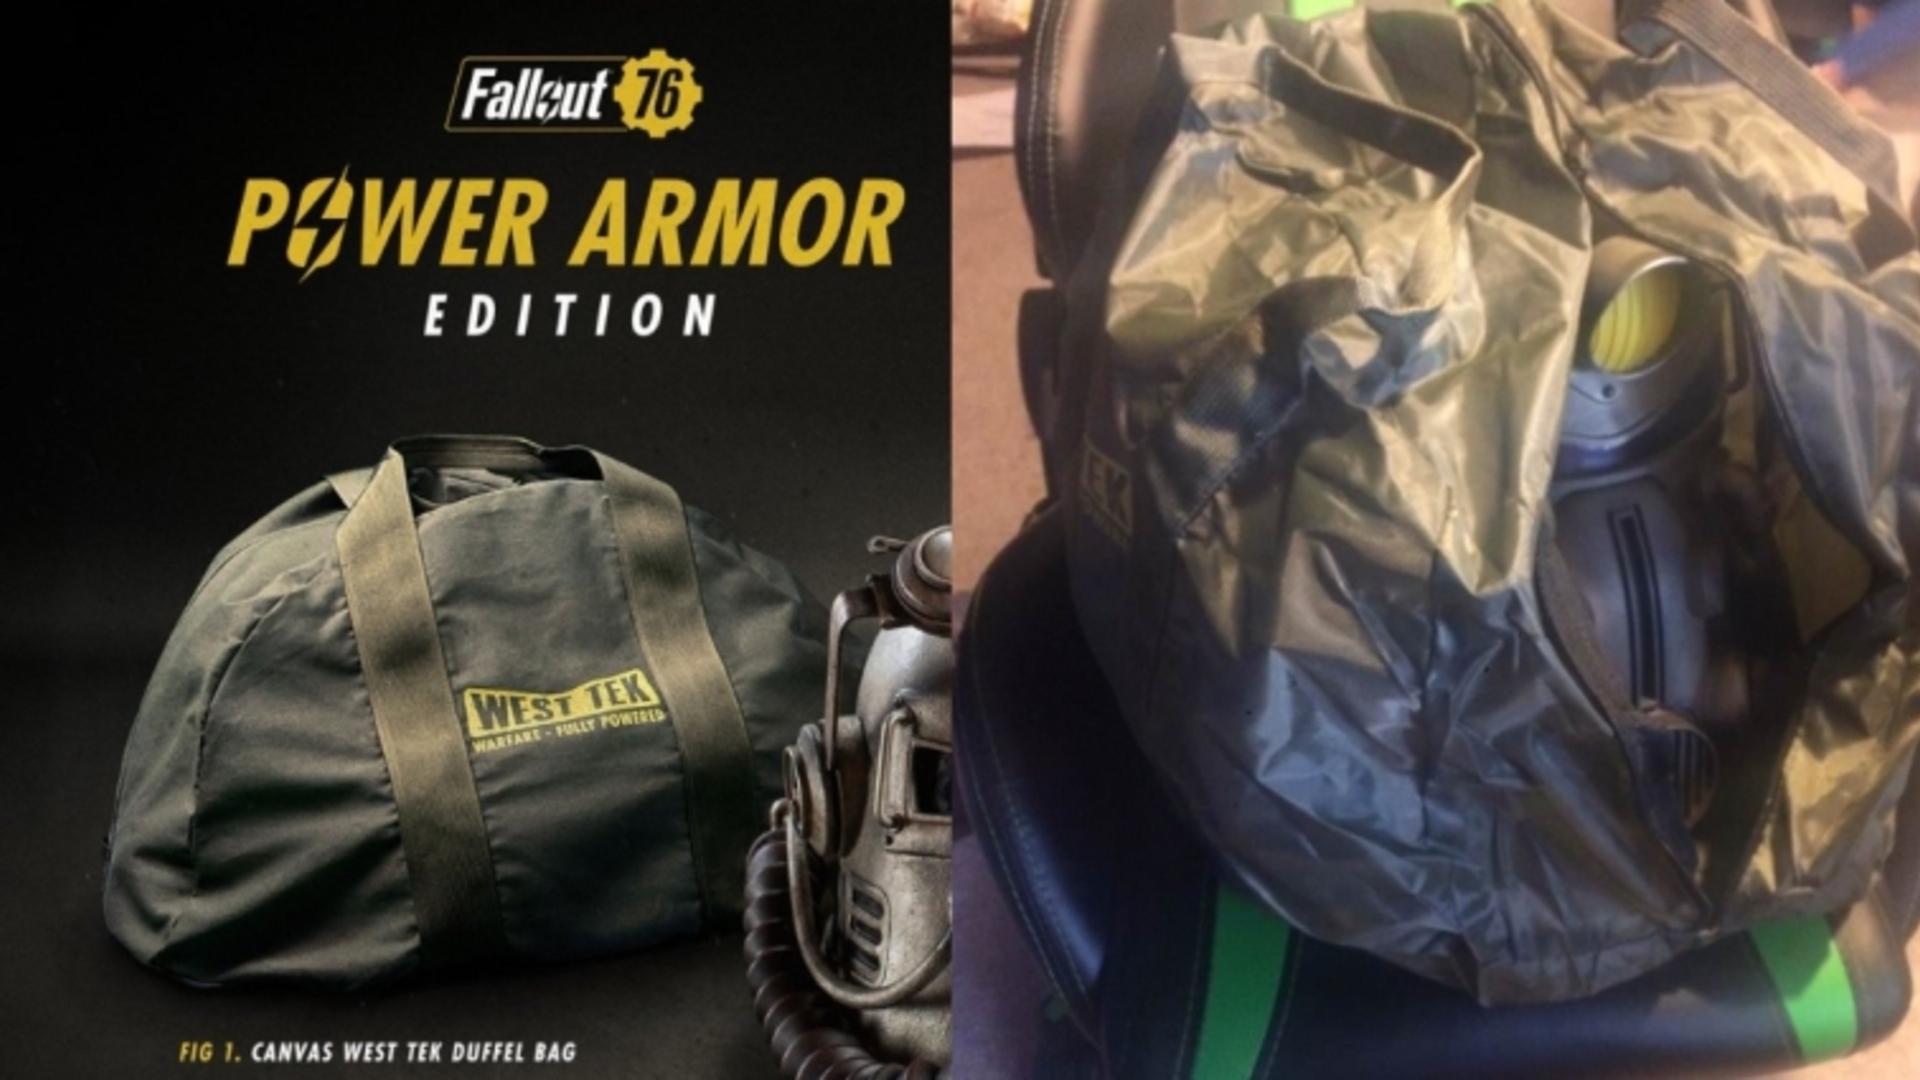 Bethesdan kassit ja roskapussit Fallout 76